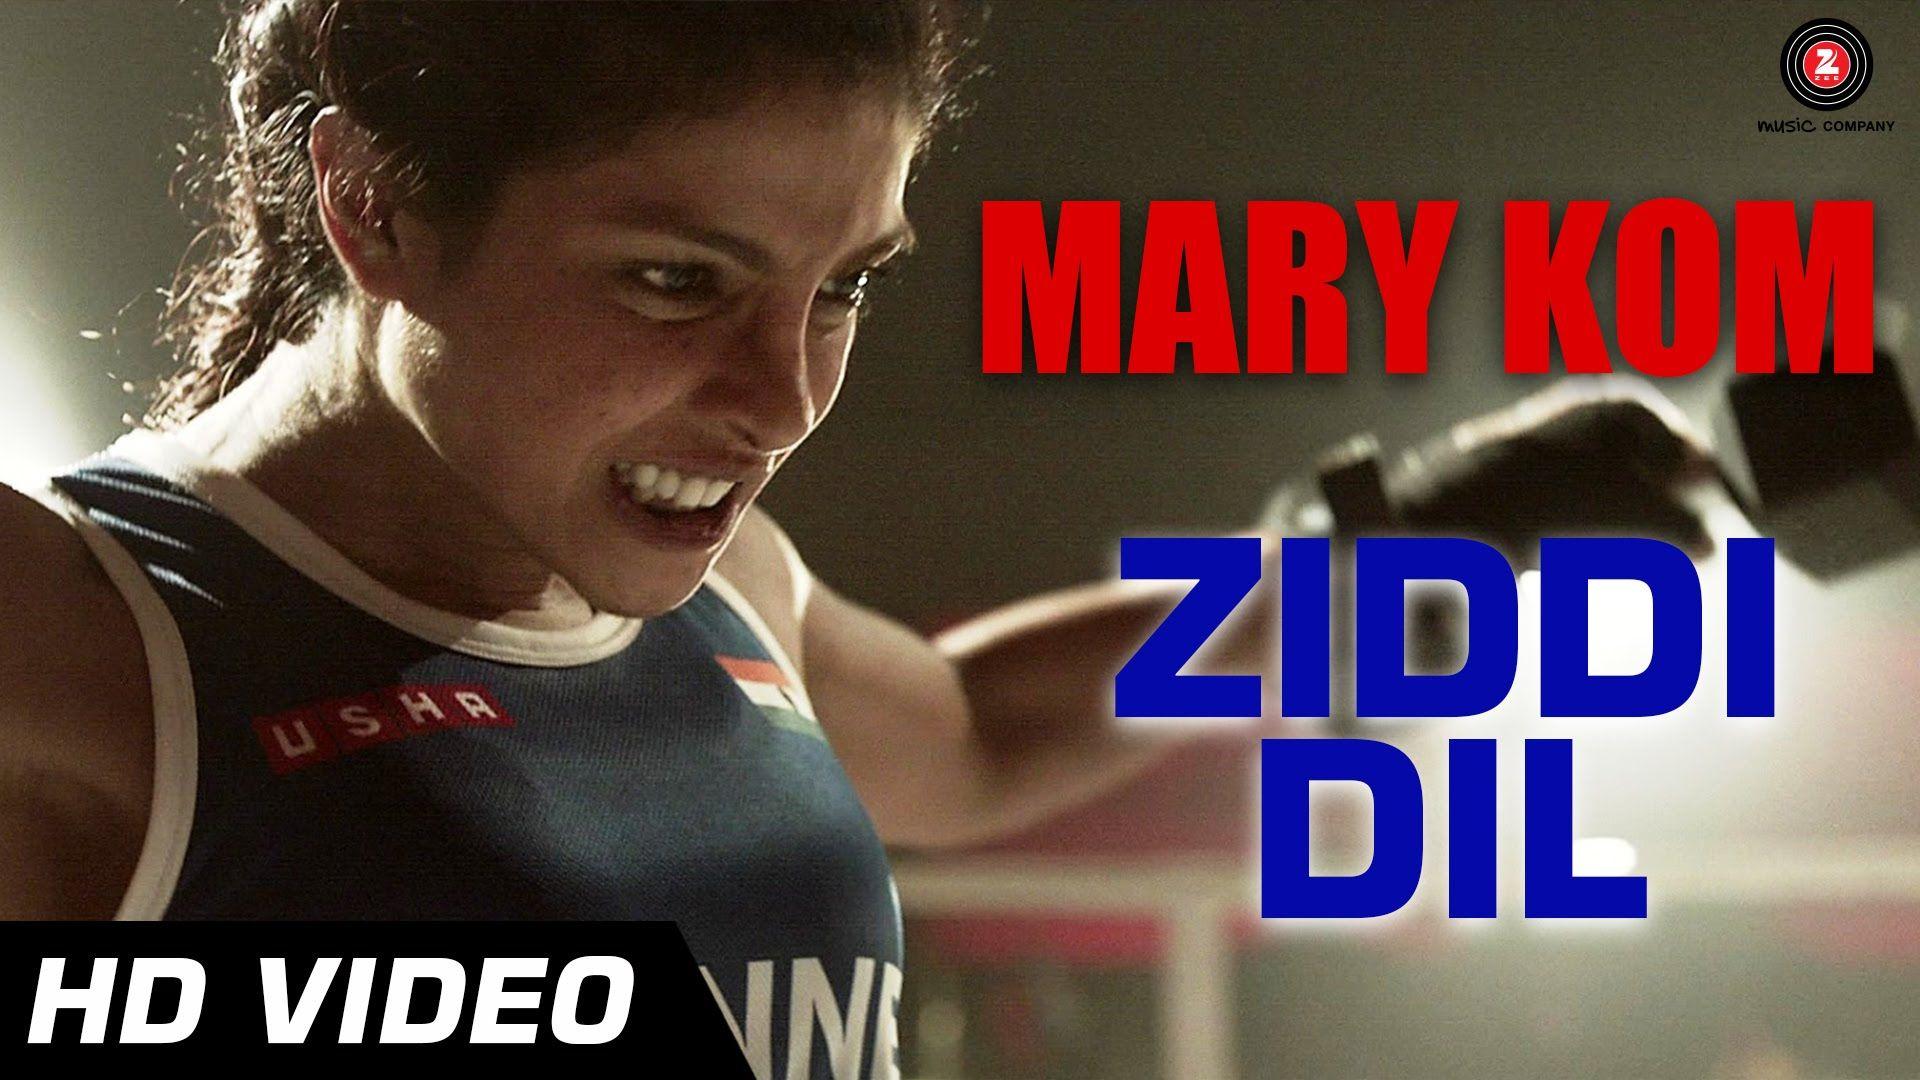 Ziddi Dil Official Video Mary Kom Feat Priyanka Chopra